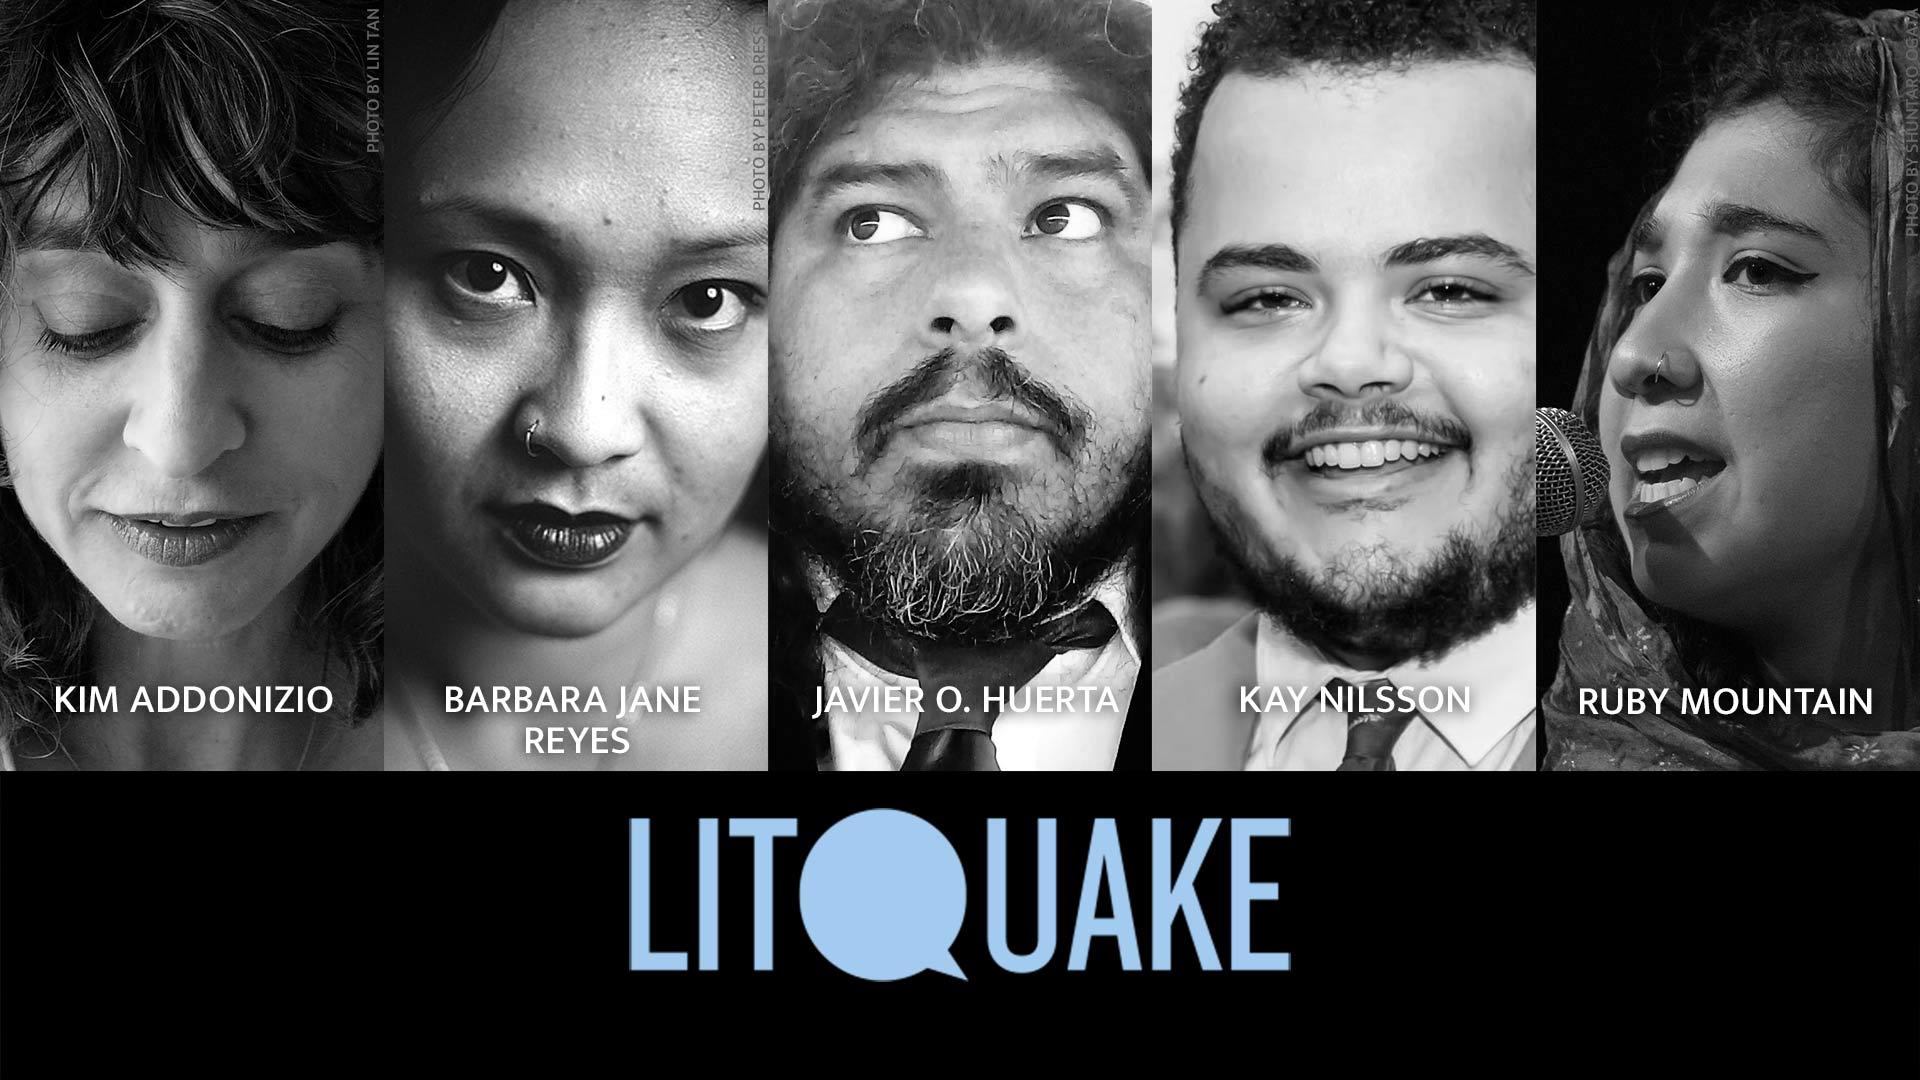 Photos of poets Kim Addonizio, Barbara Jane Reyes, Javier O. Huerta, Kay Nilsson, and musical guest Ruby Mountain.